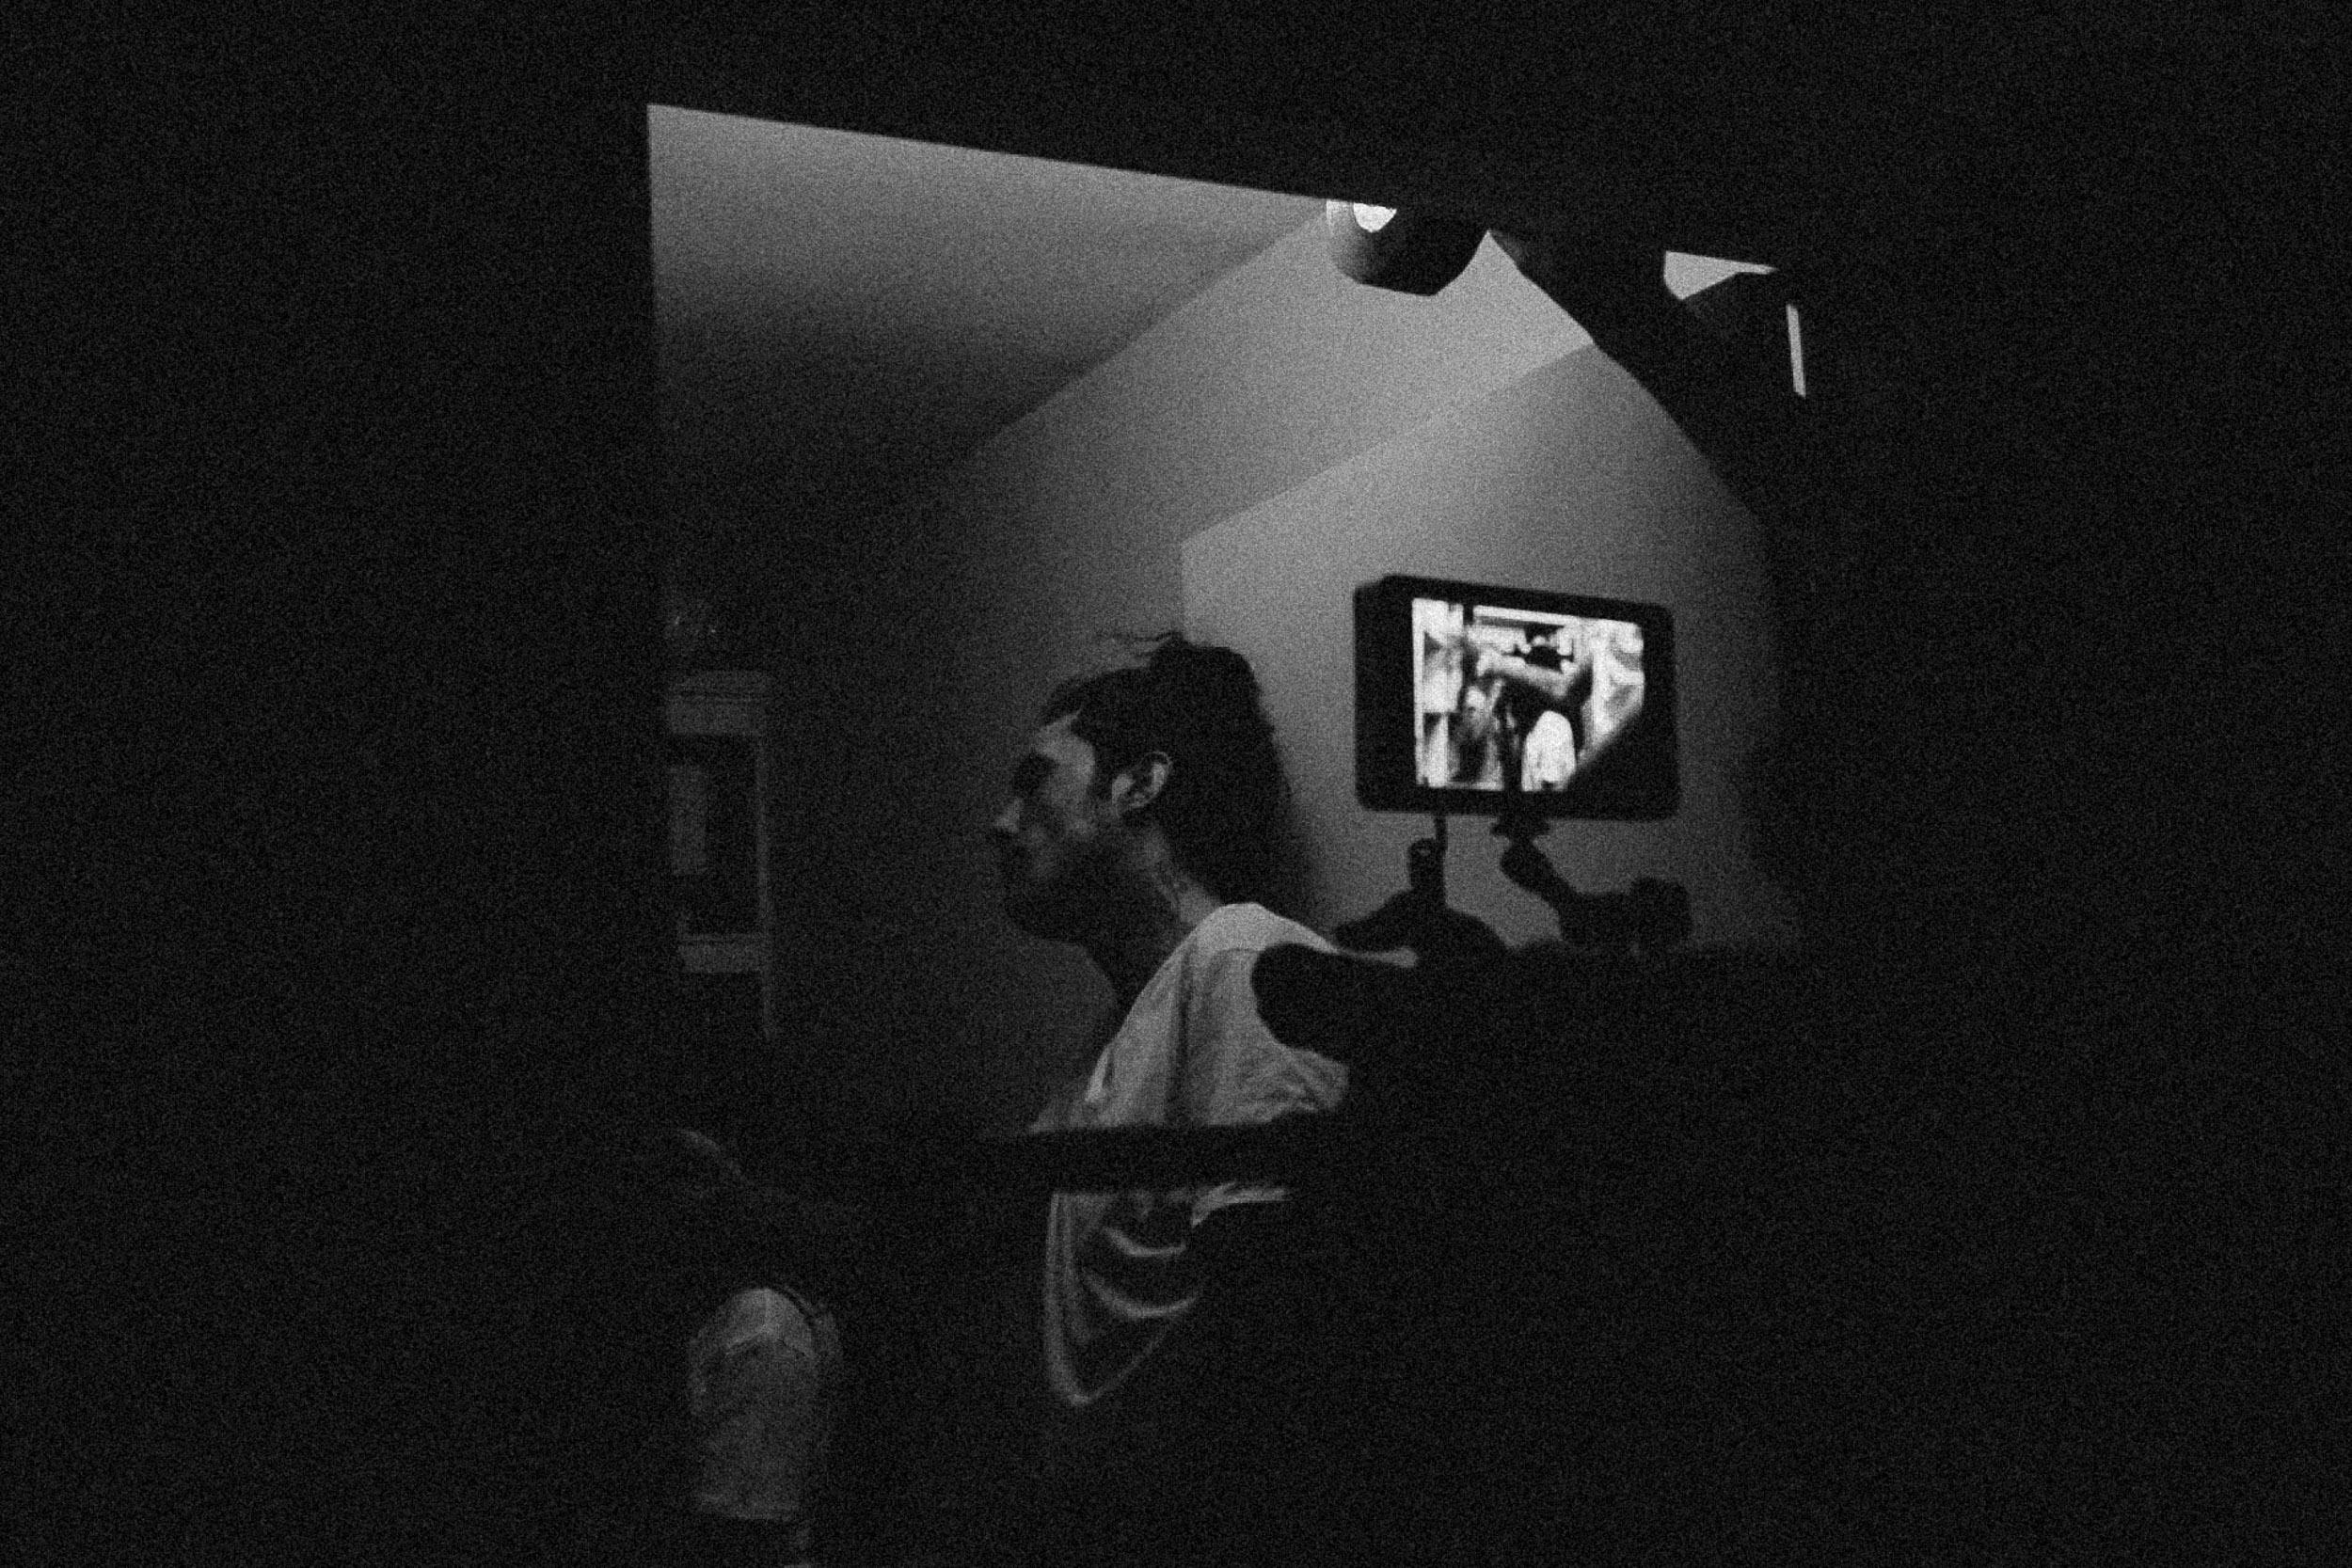 film-archive-kc.locke-44.jpg